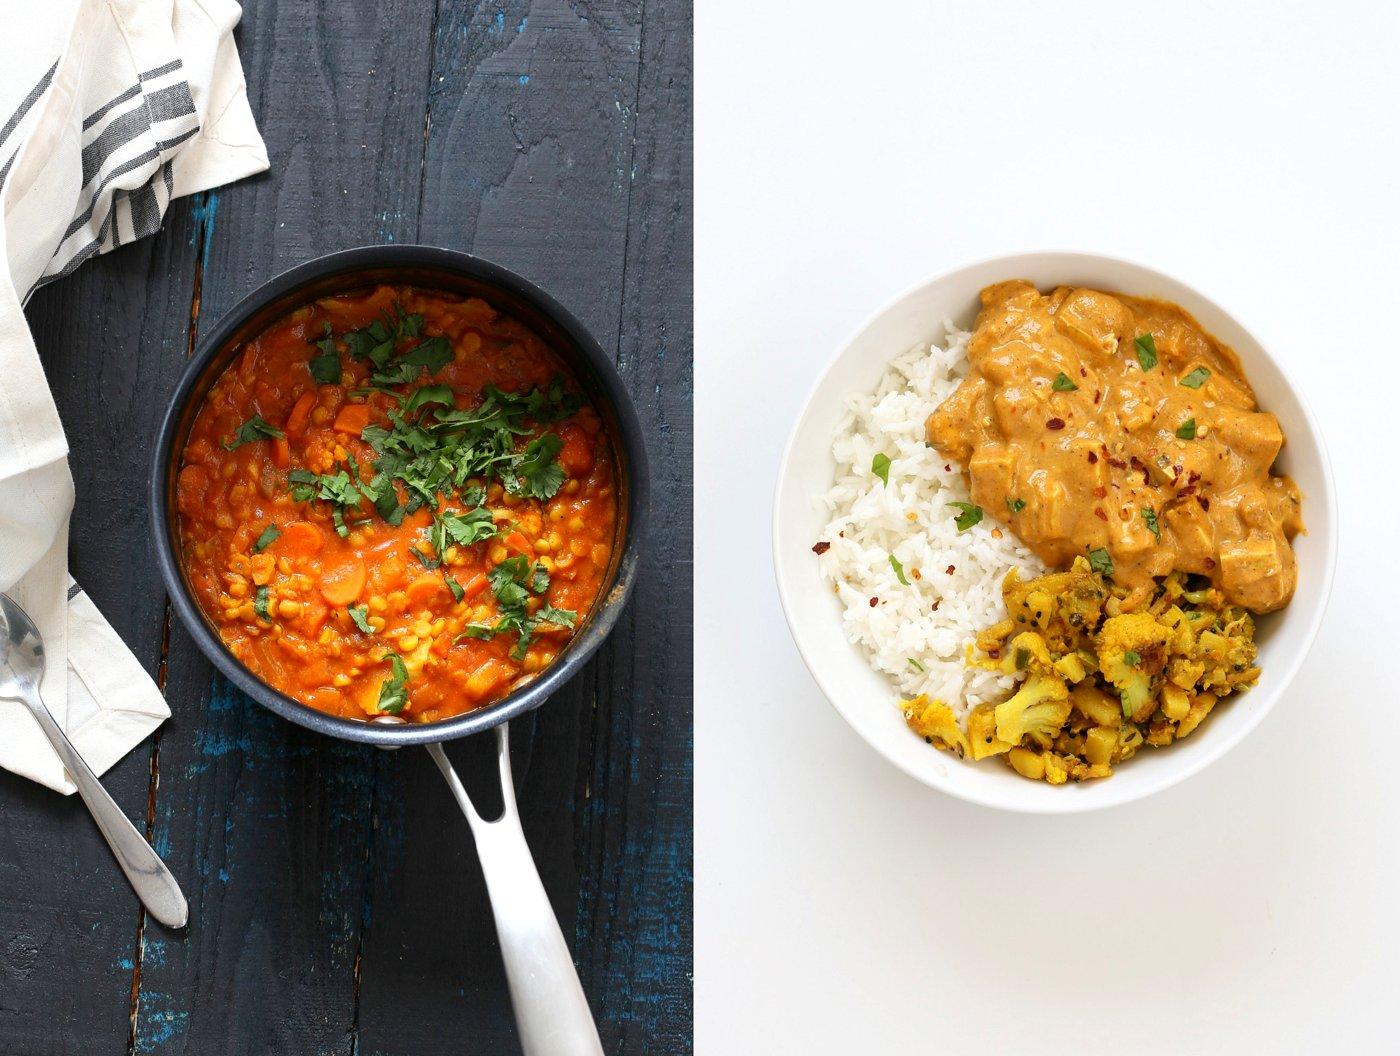 Spli Pea Soup and Masala Tofu Bowl | VeganRicha.com